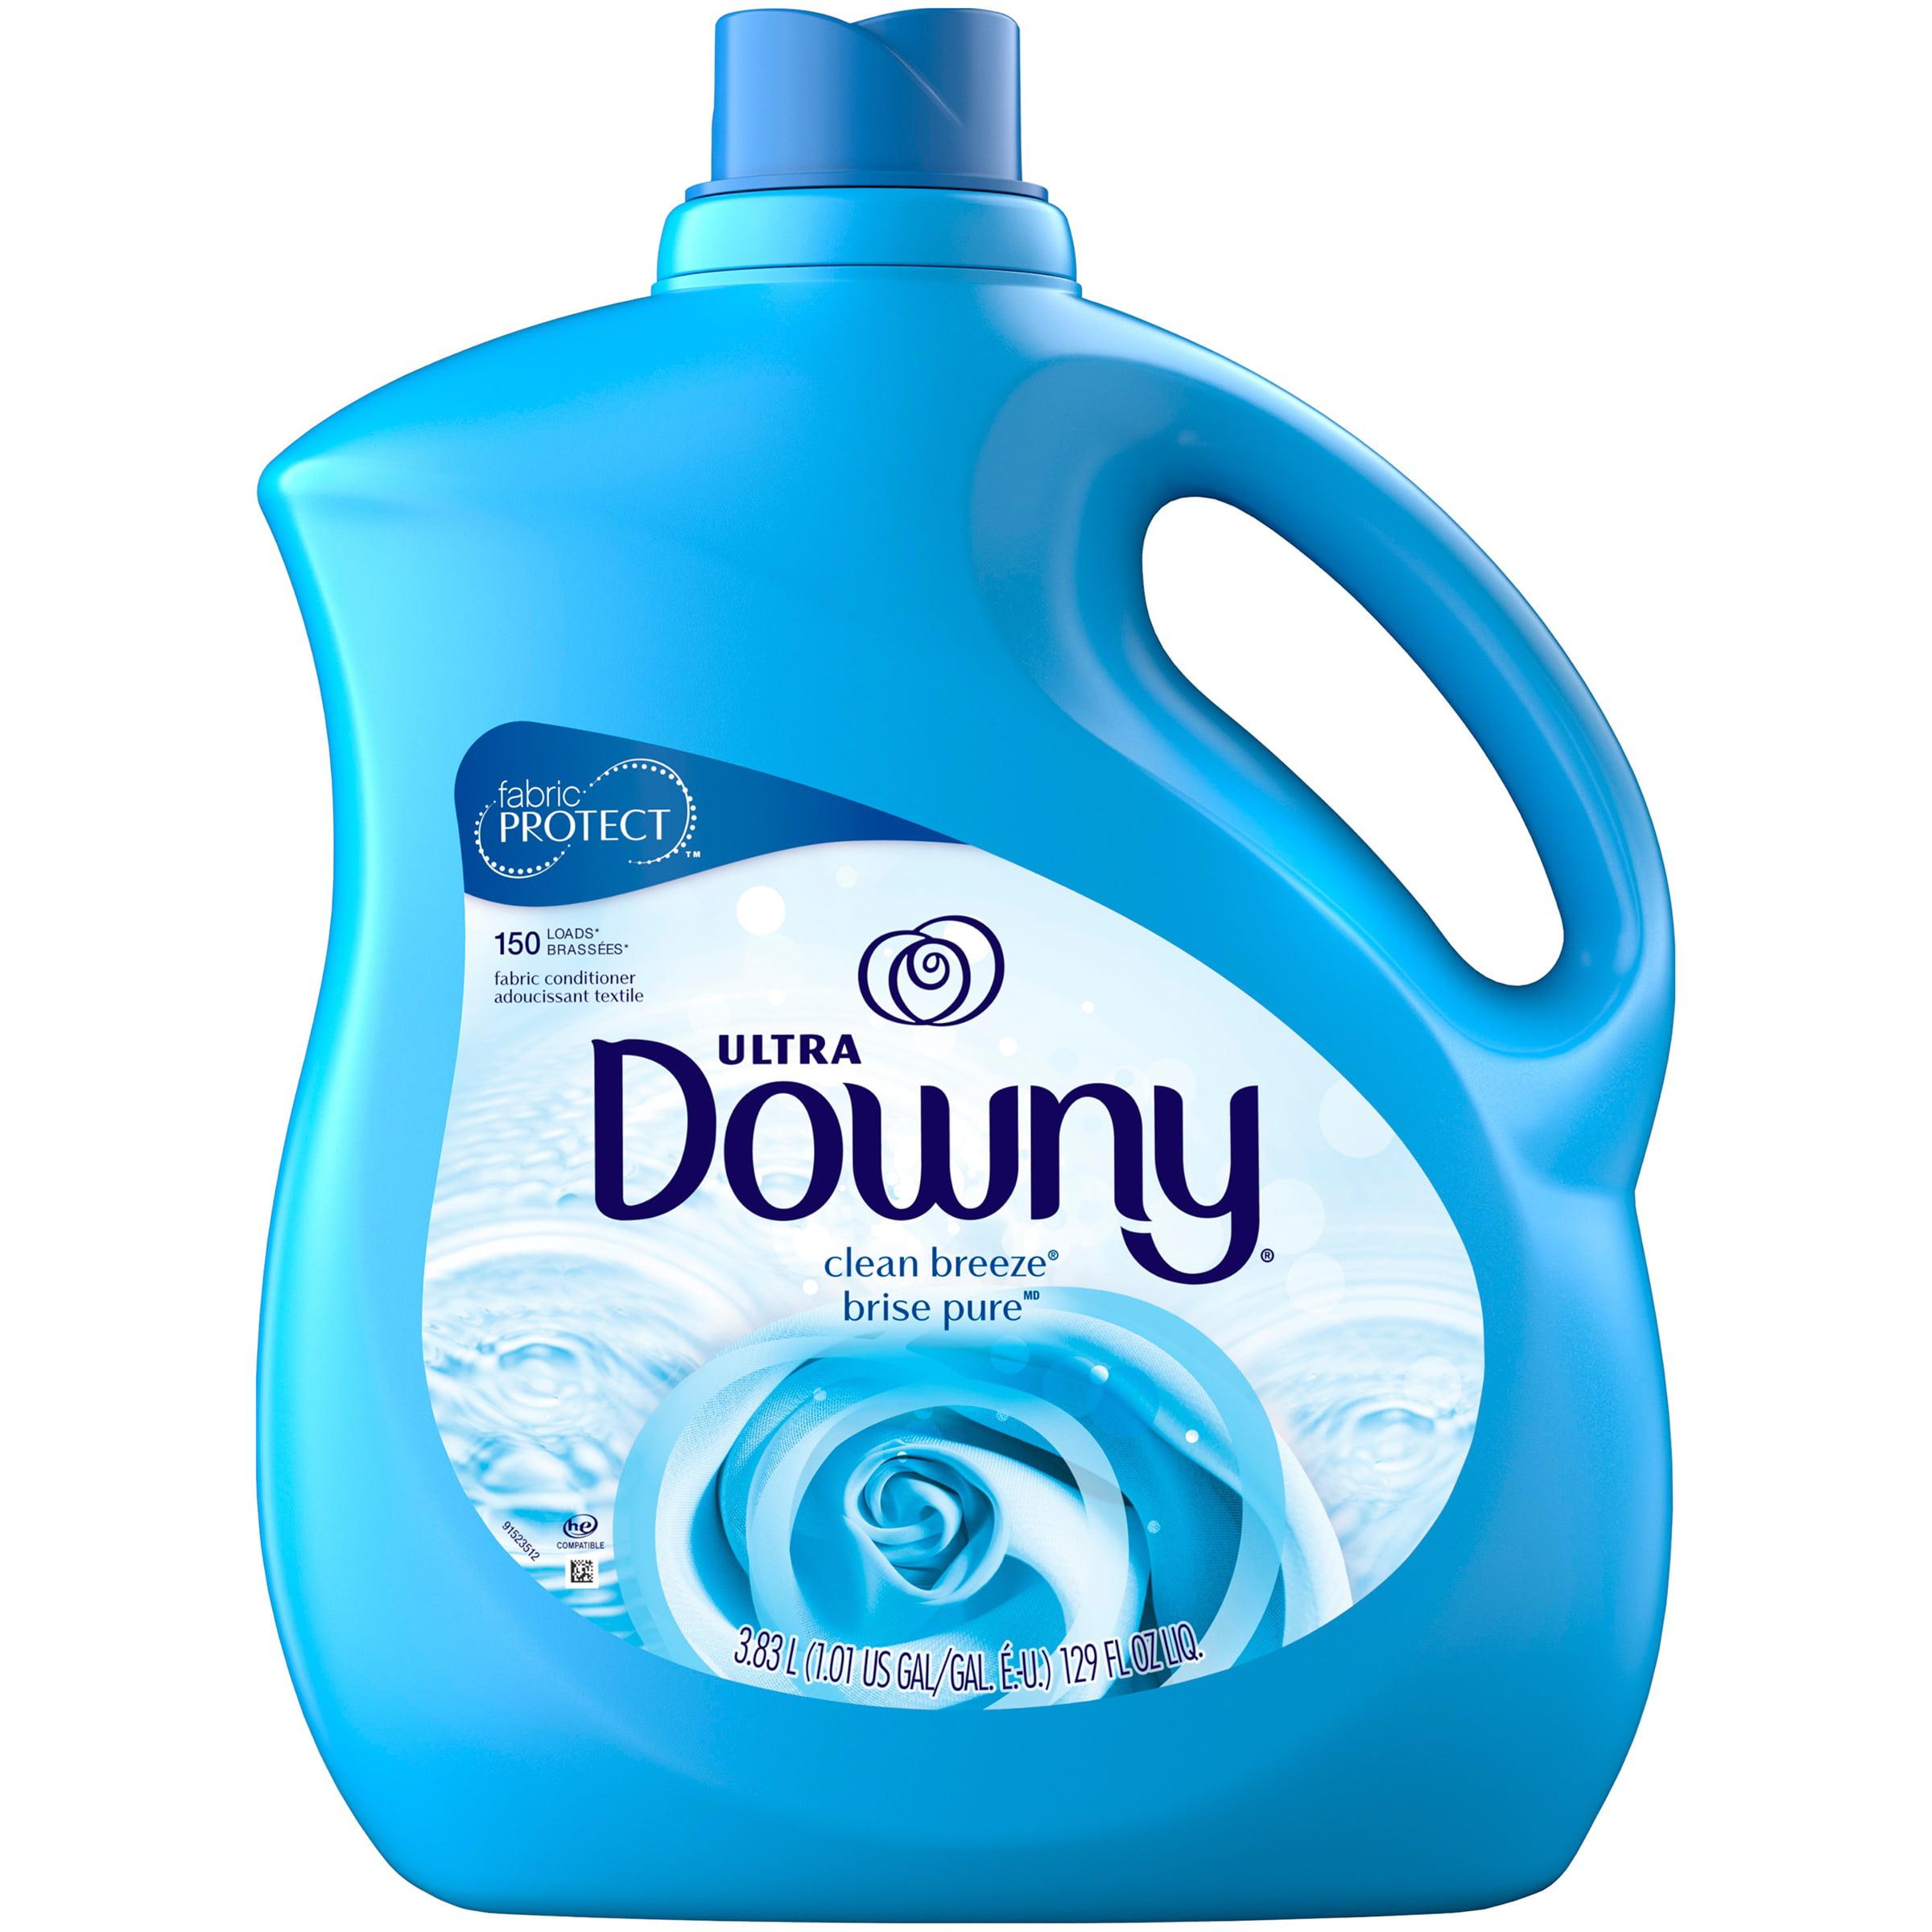 Downy Ultra Liquid Fabric Conditioner, Clean Breeze, 150 Loads 129 fl oz